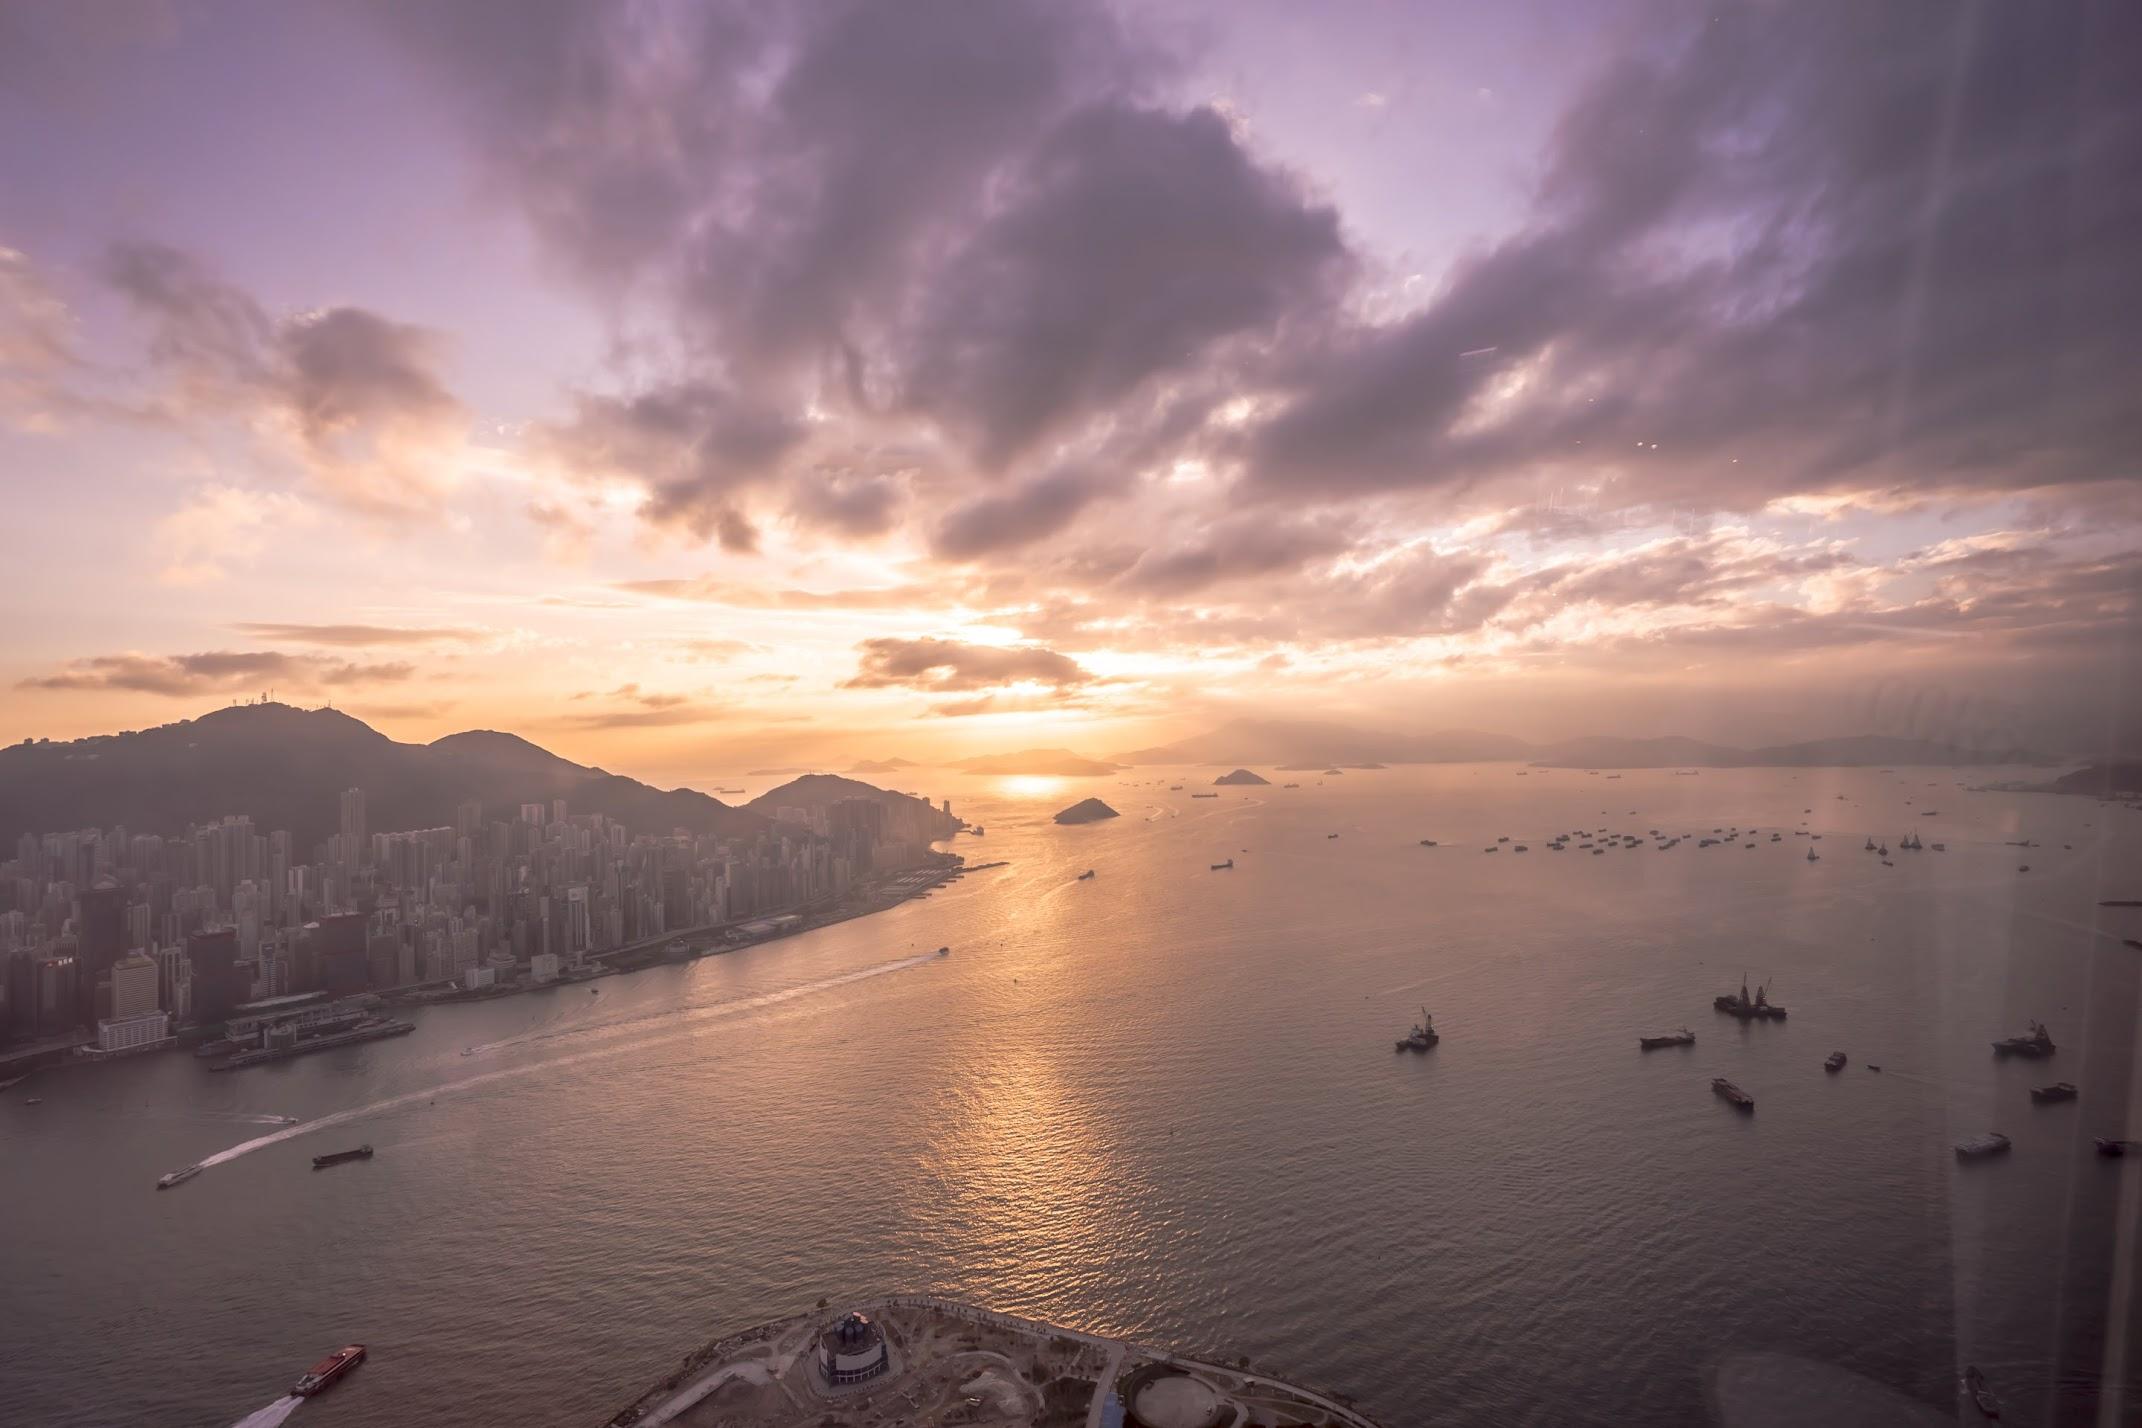 Hong Kong sky100 (天際100) evening1